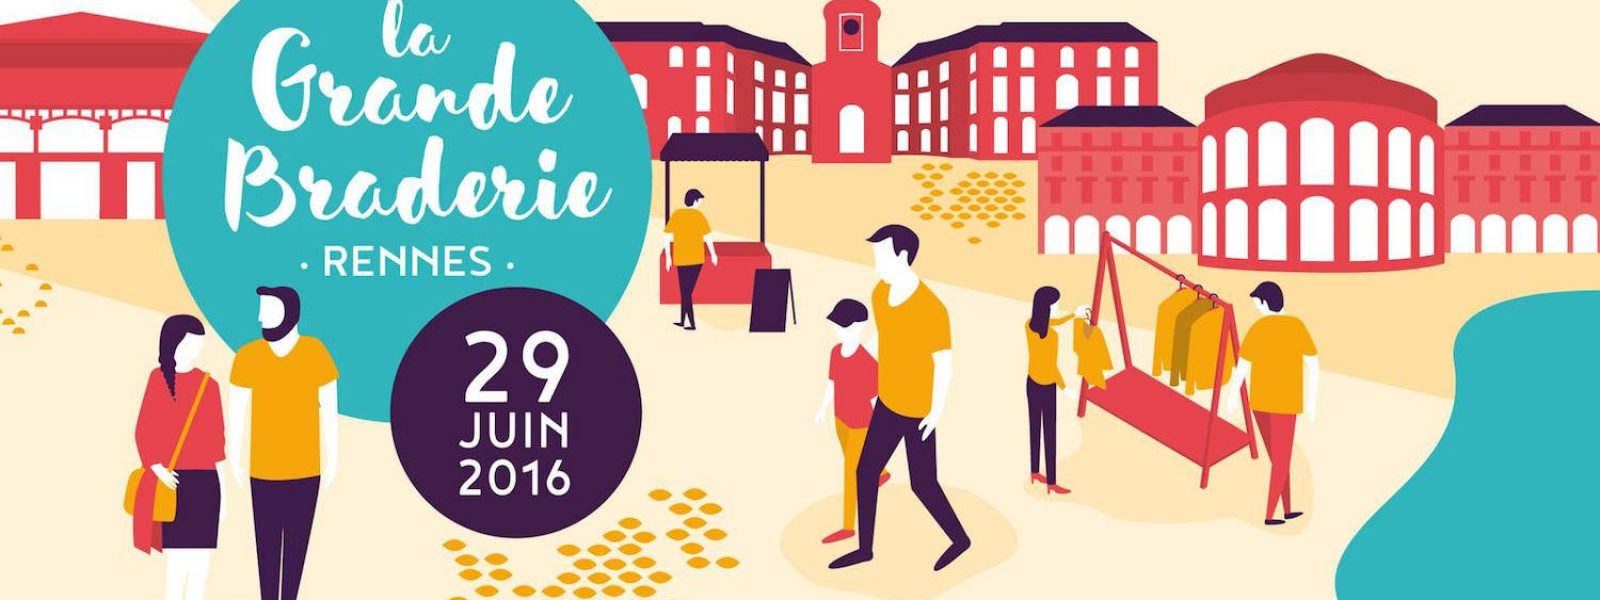 Grande-Braderie-Rennes-2